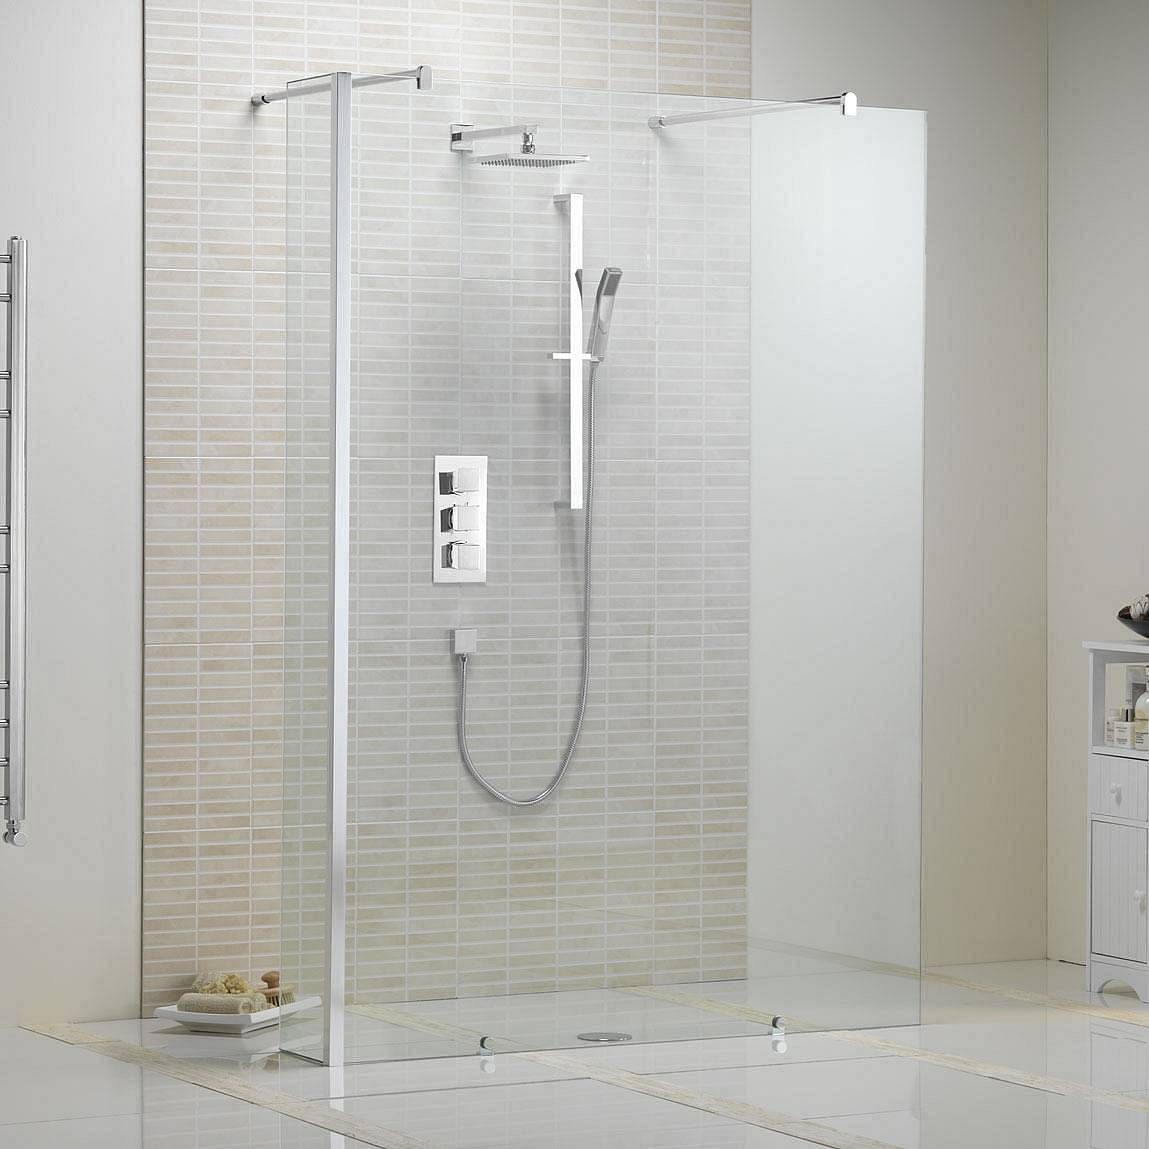 V10 Luxury Minimalist Glass Panel 1150 Wet Room Shower Screens